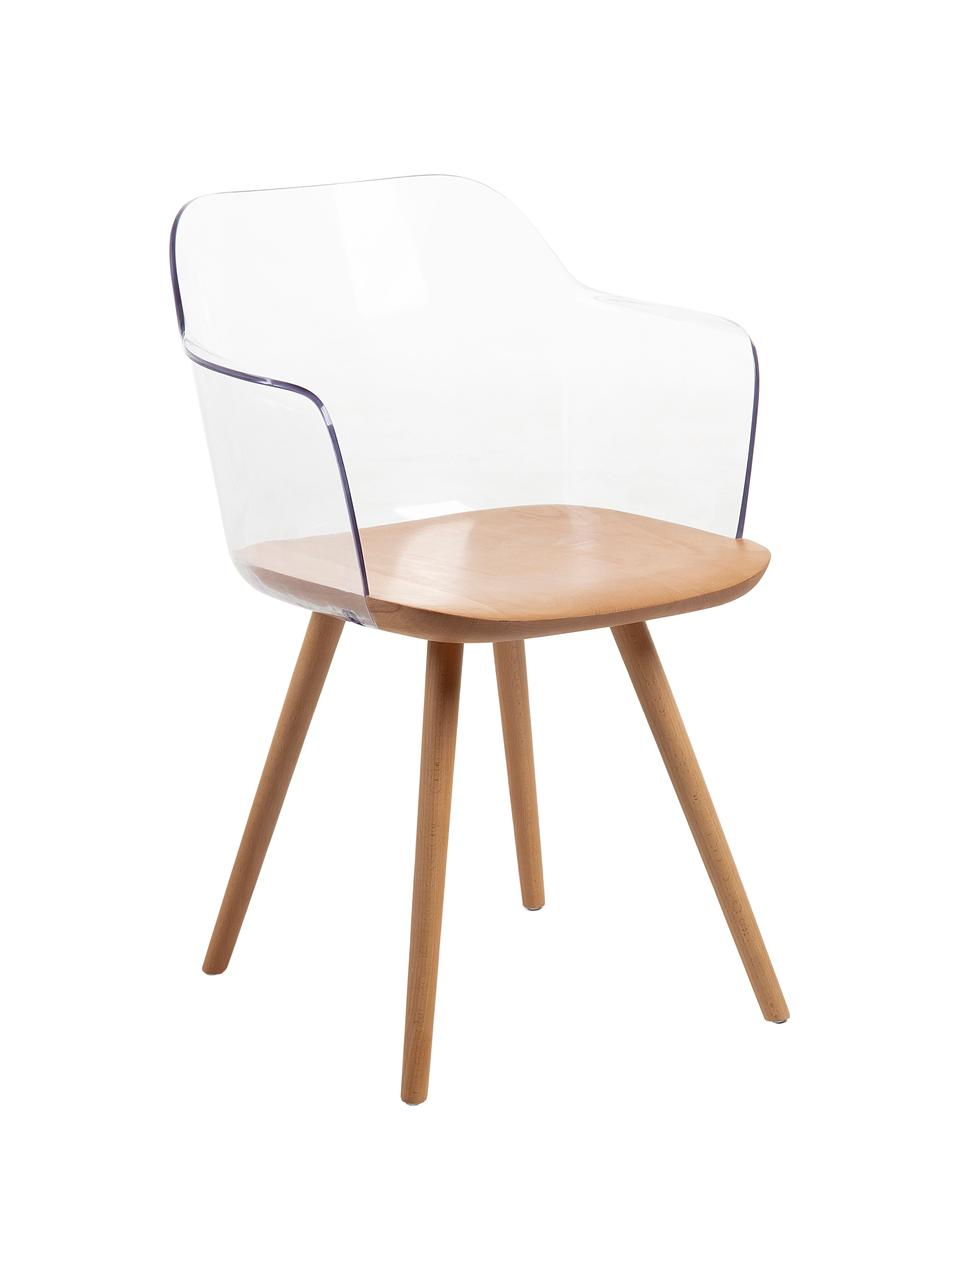 Transparente Armlehnstühle Bjorg, 2 Stück, Rückenlehne: Polycarbonat, Transparent, Buche, B 56 x T 56 cm